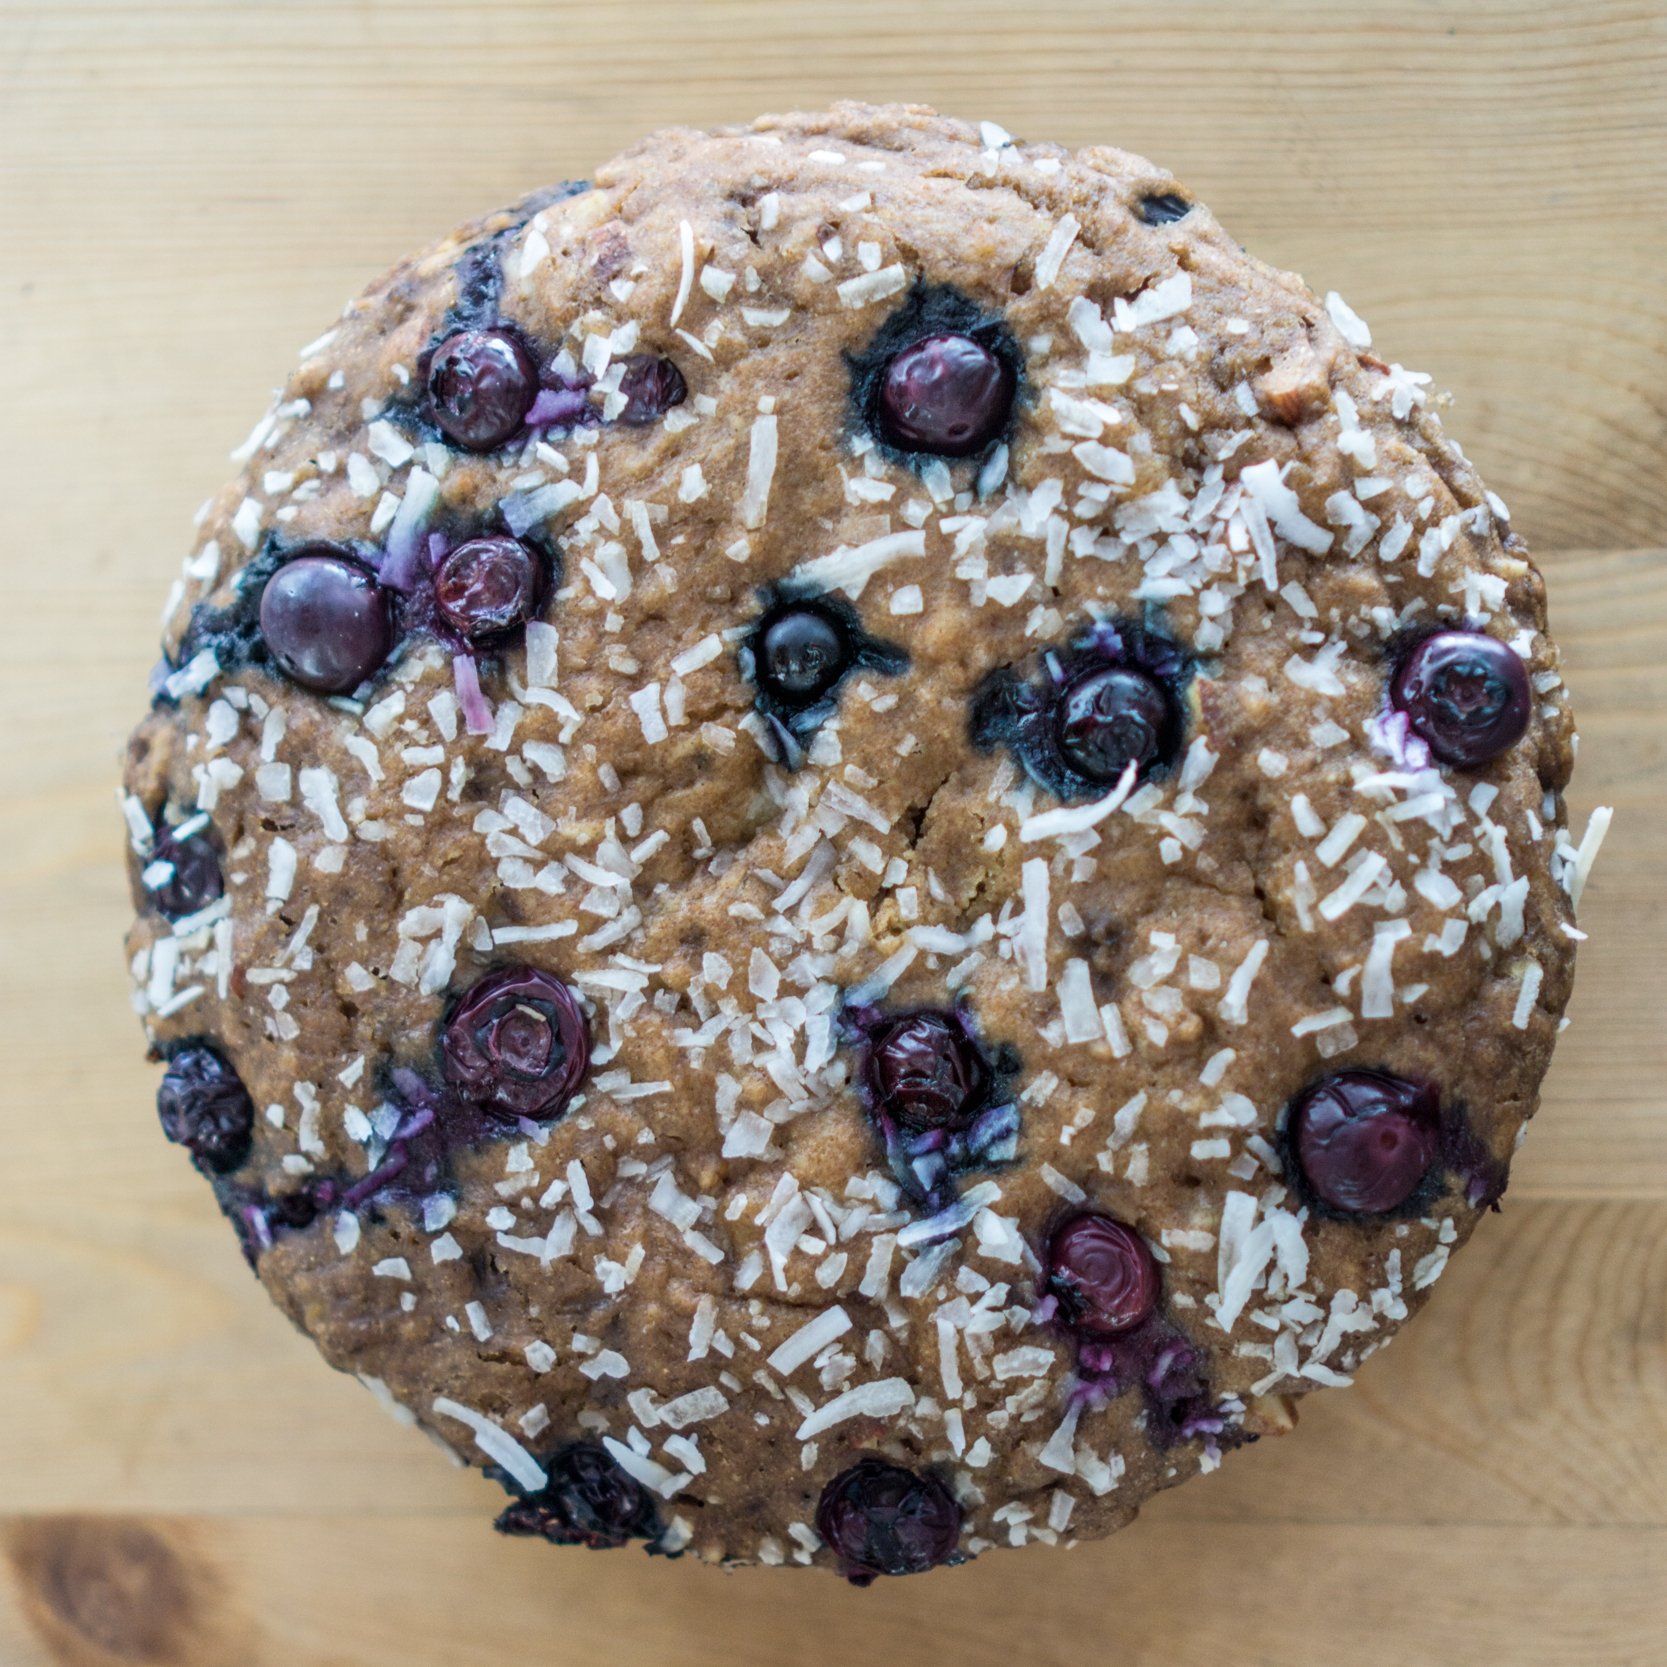 Freedom bread - recipe coming soon!